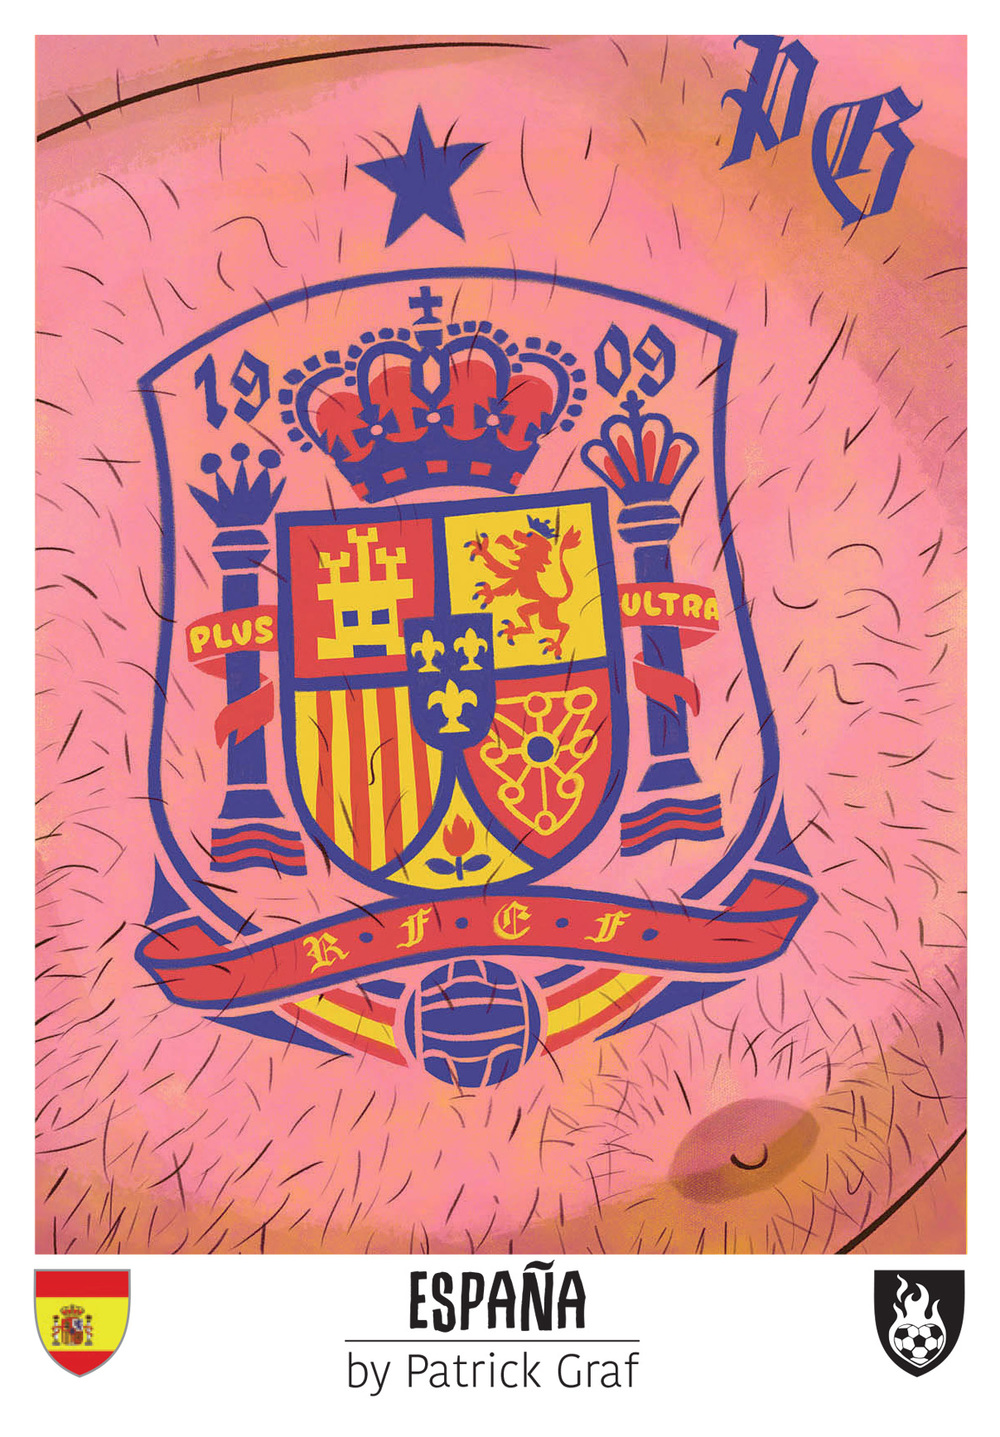 patrickgraf_]Spanien_Wappen_2.jpg